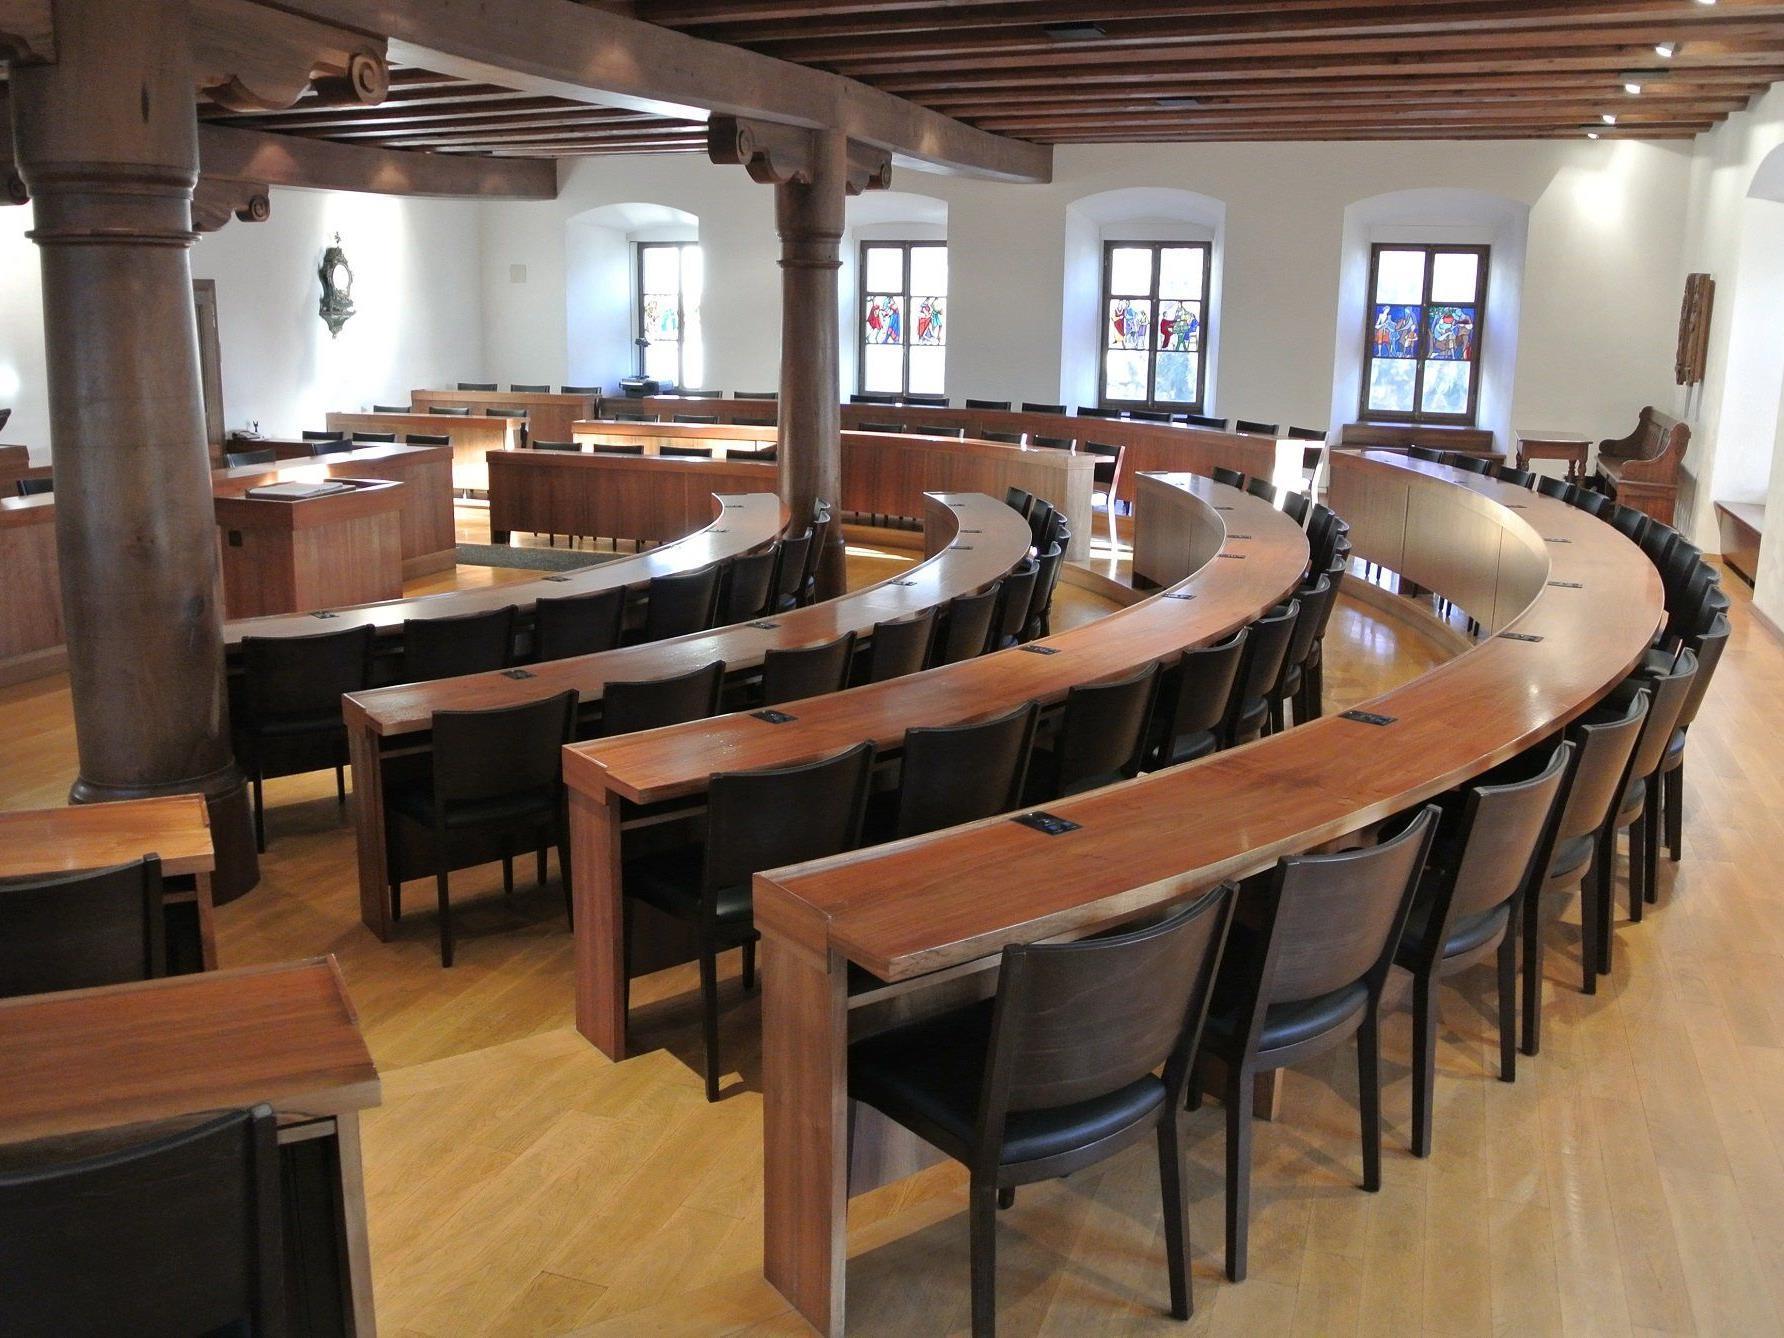 Stuhlhersteller Längle Hagspiel Stattet Regierungssaal Des Kantons